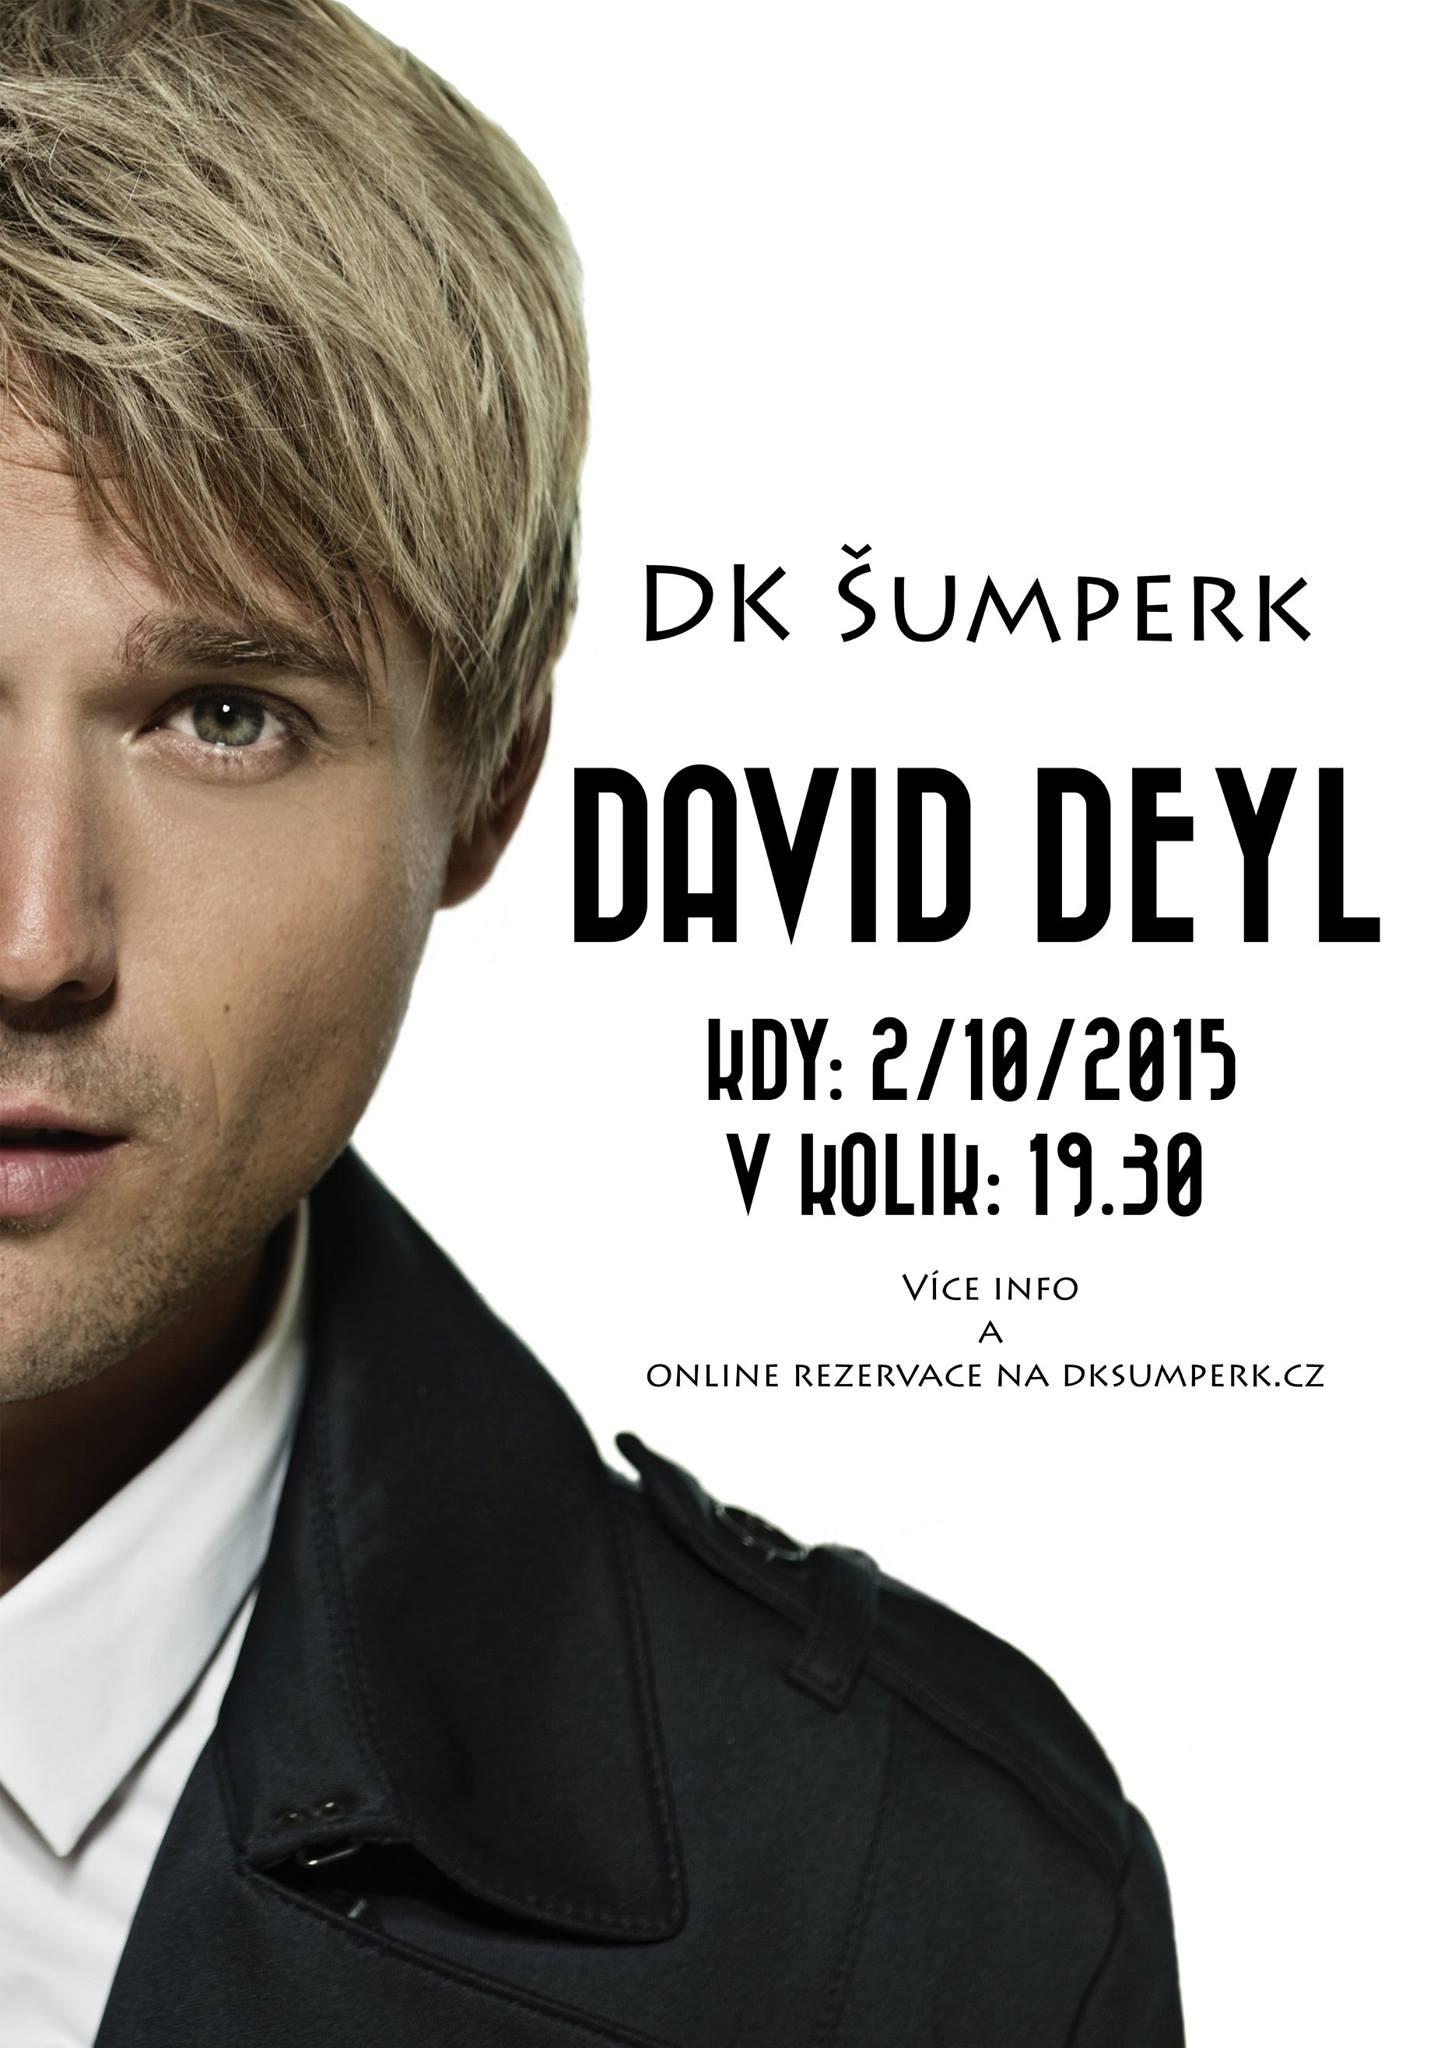 David Deyl v Šumperku zdroj foto: dk